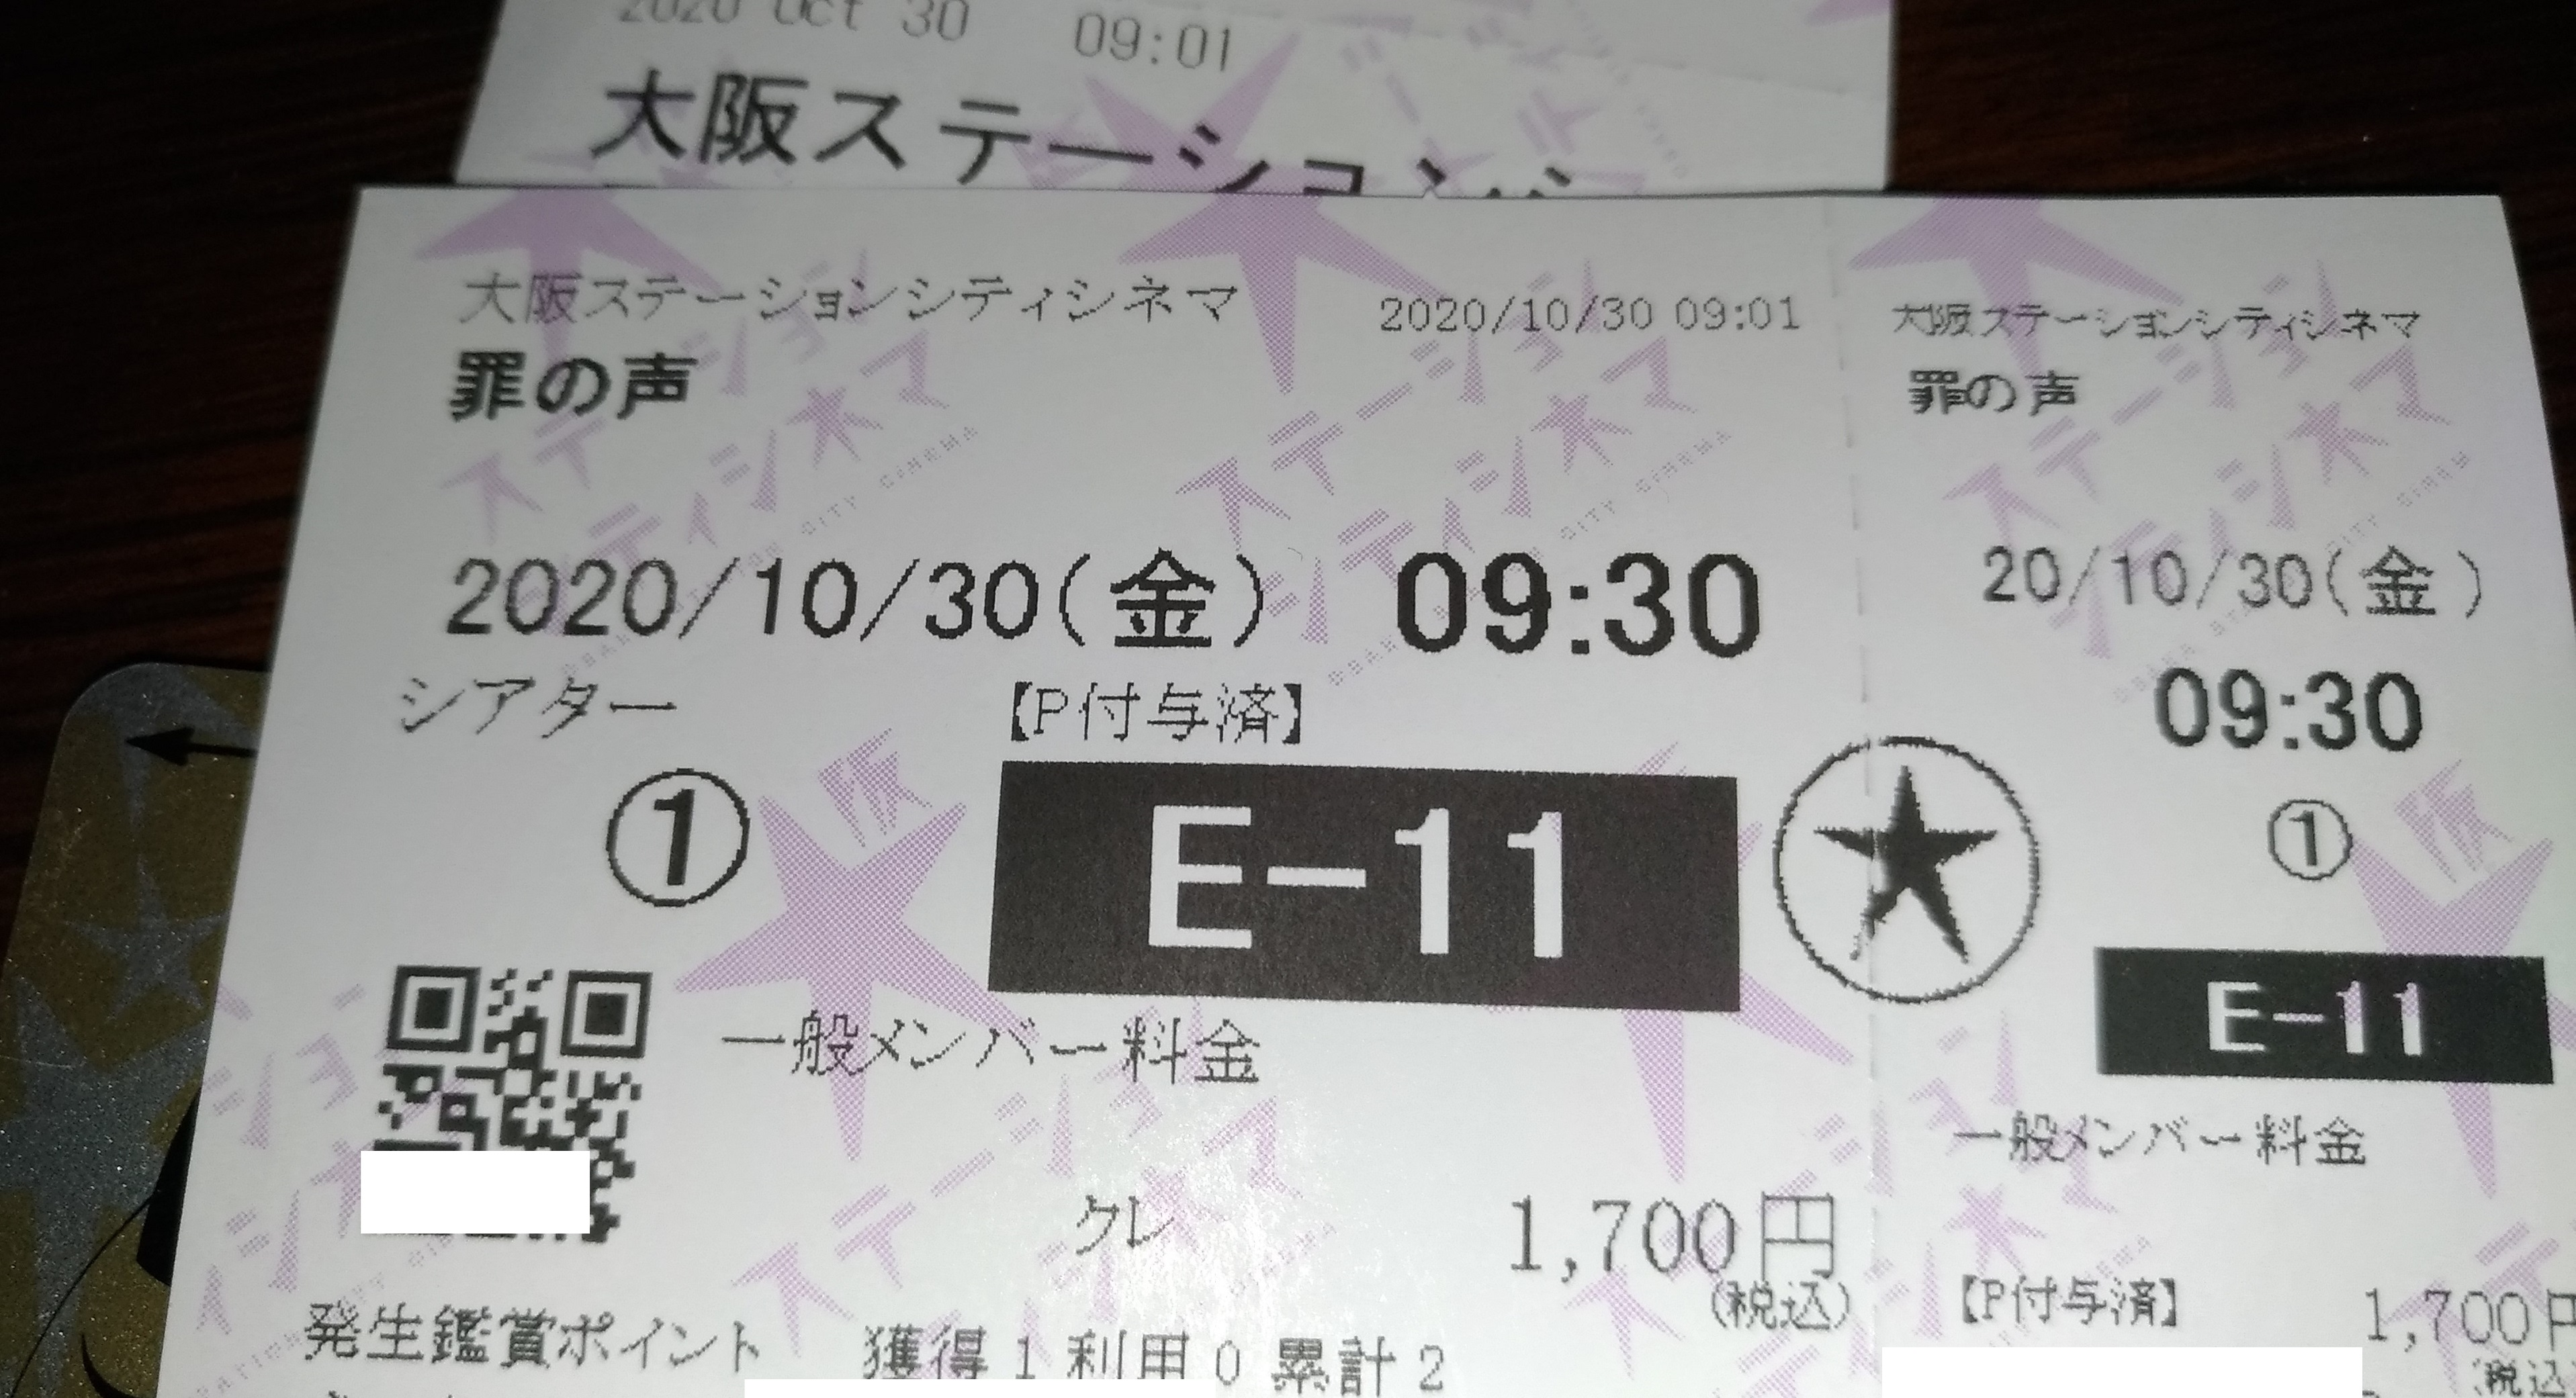 movies_eiga_1700_osaka_1030_1.jpg